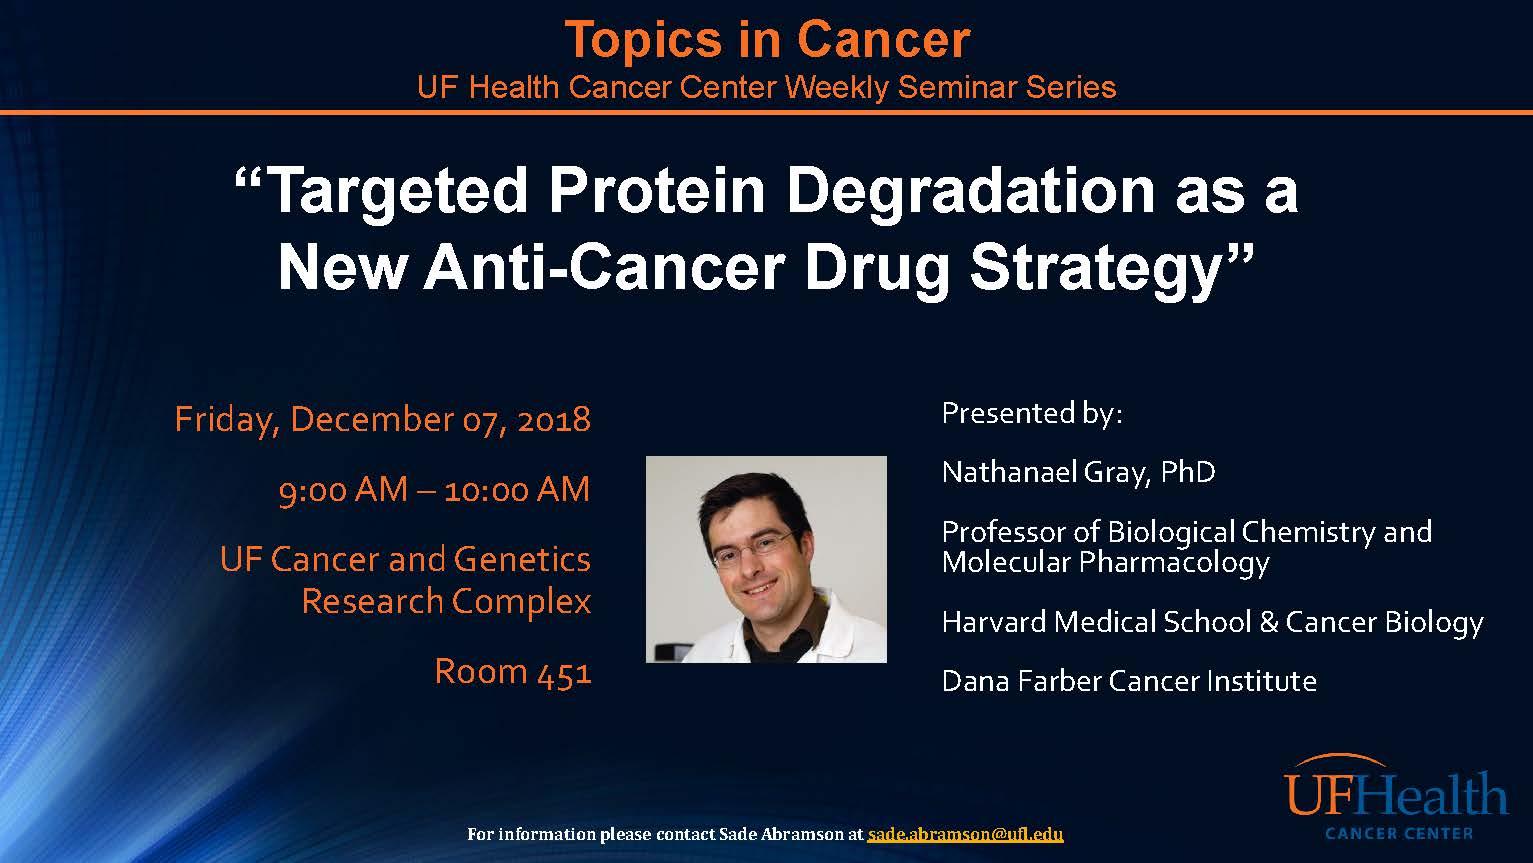 Guest Lecturer: Nathanael Gray, Ph.D.